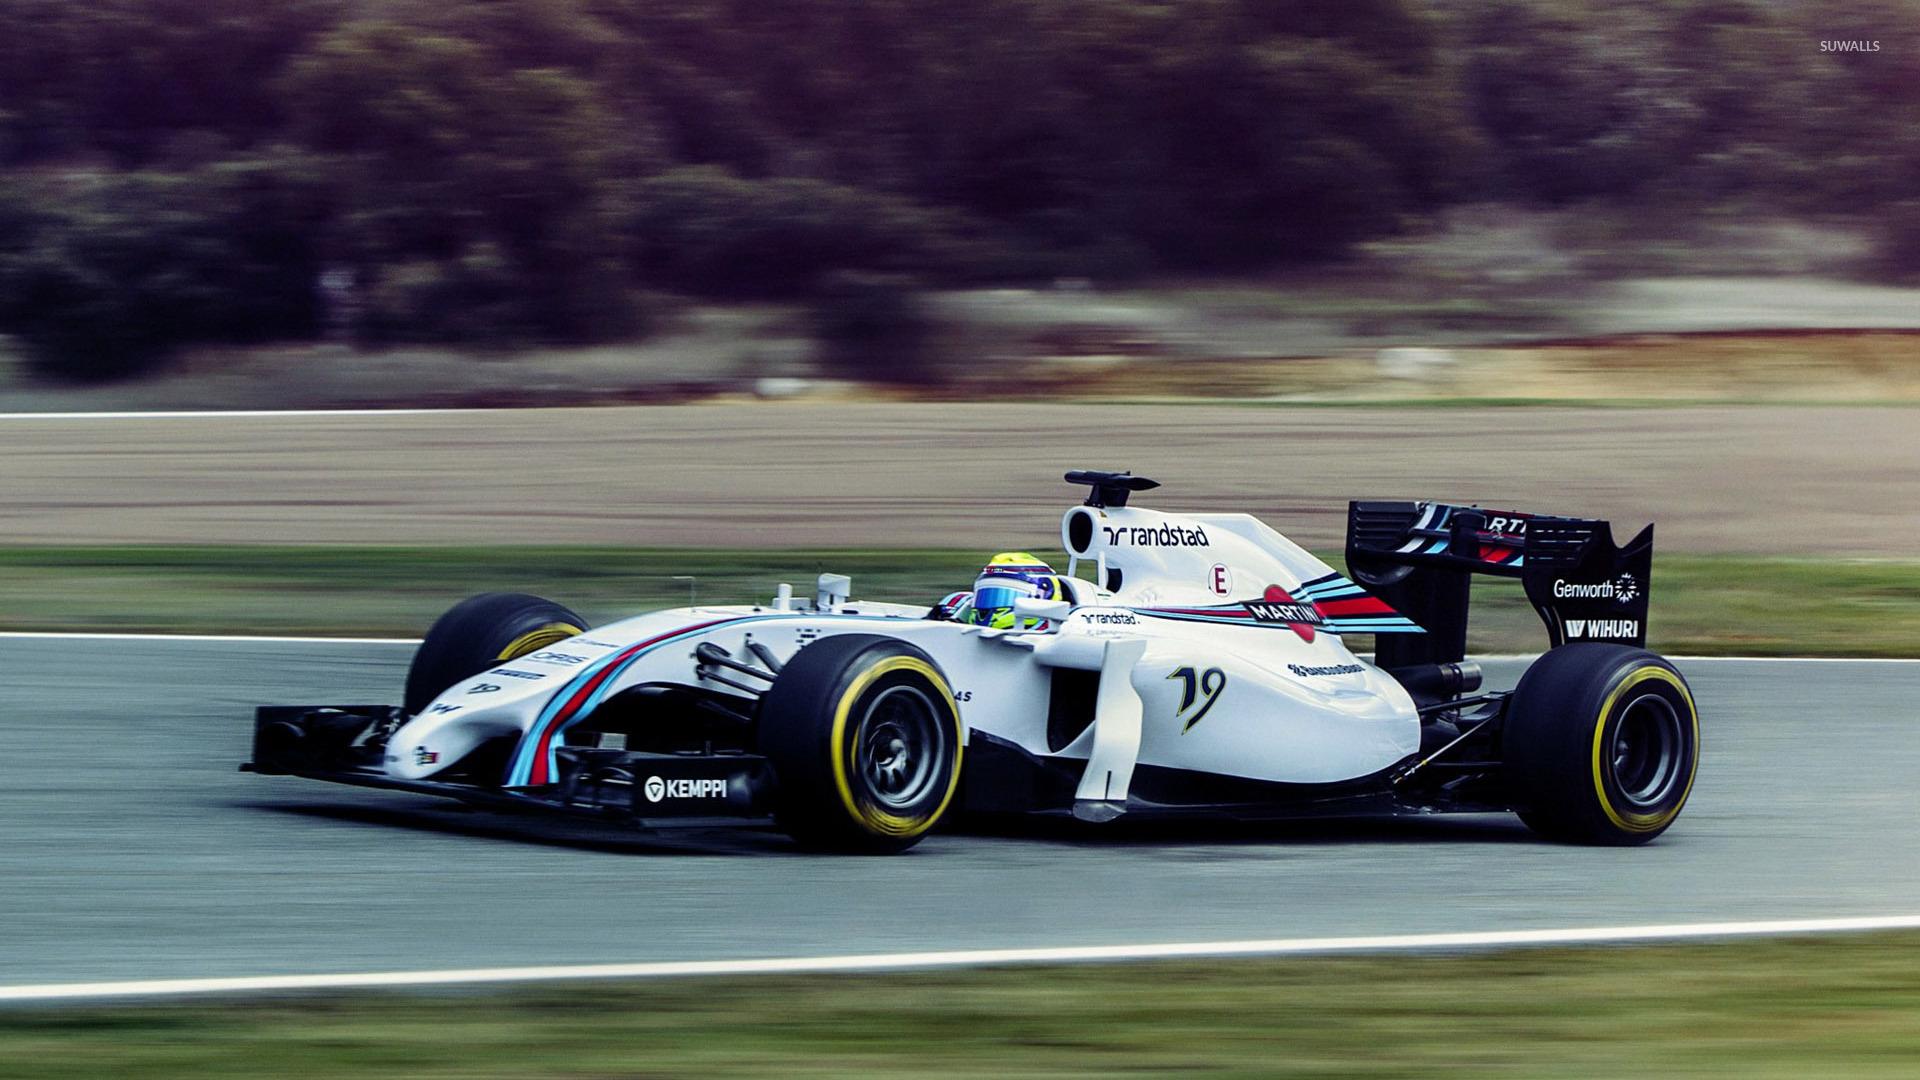 F1 cars wallpapers ferrari 11